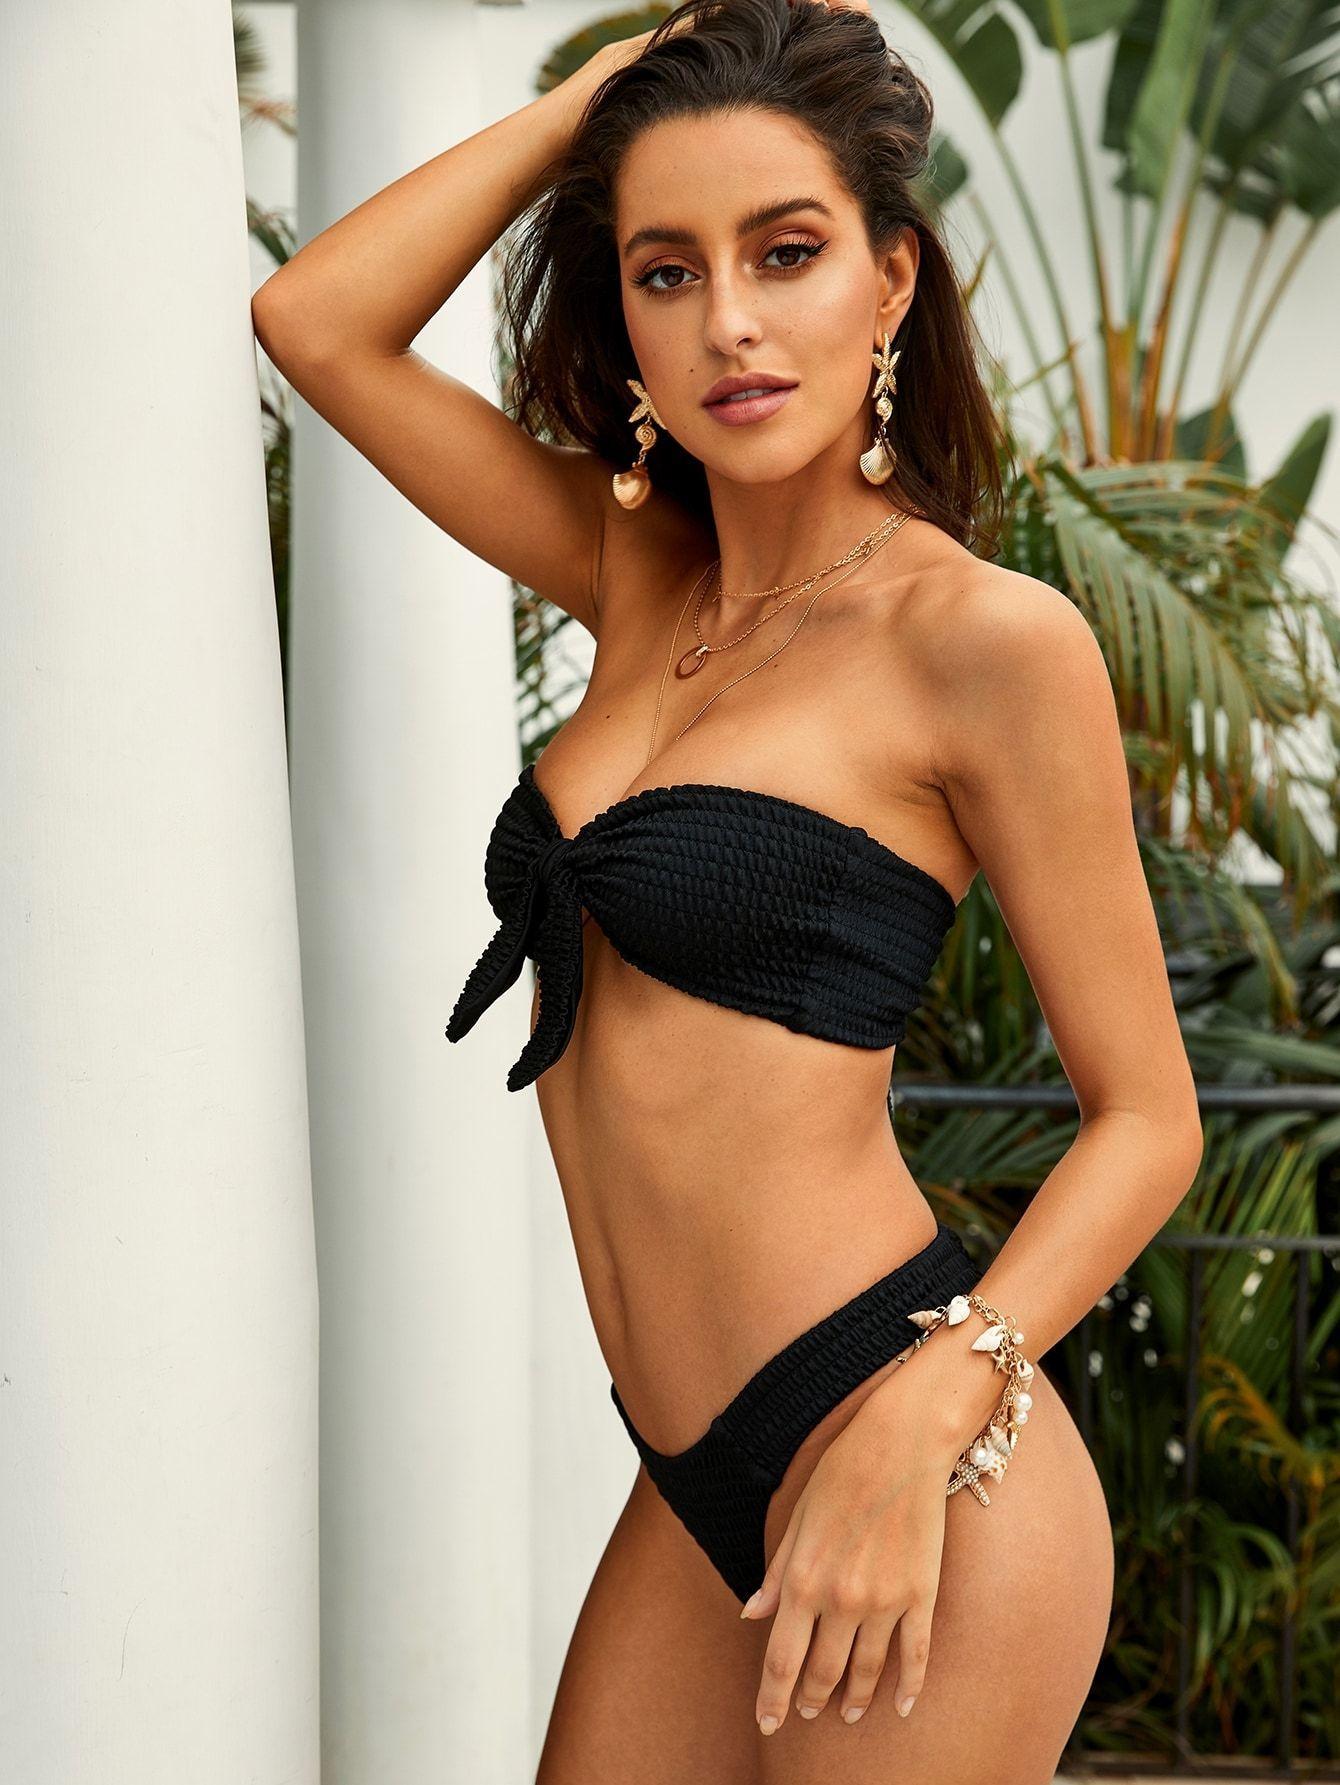 0e73b4d961 Smocked Knot Front Bandeau With High Cut Bikini - Popviva #swimwear  #sportswear #monokini #beachwear #lingerie #swimsuit #bathing #undergarment  #tankini ...